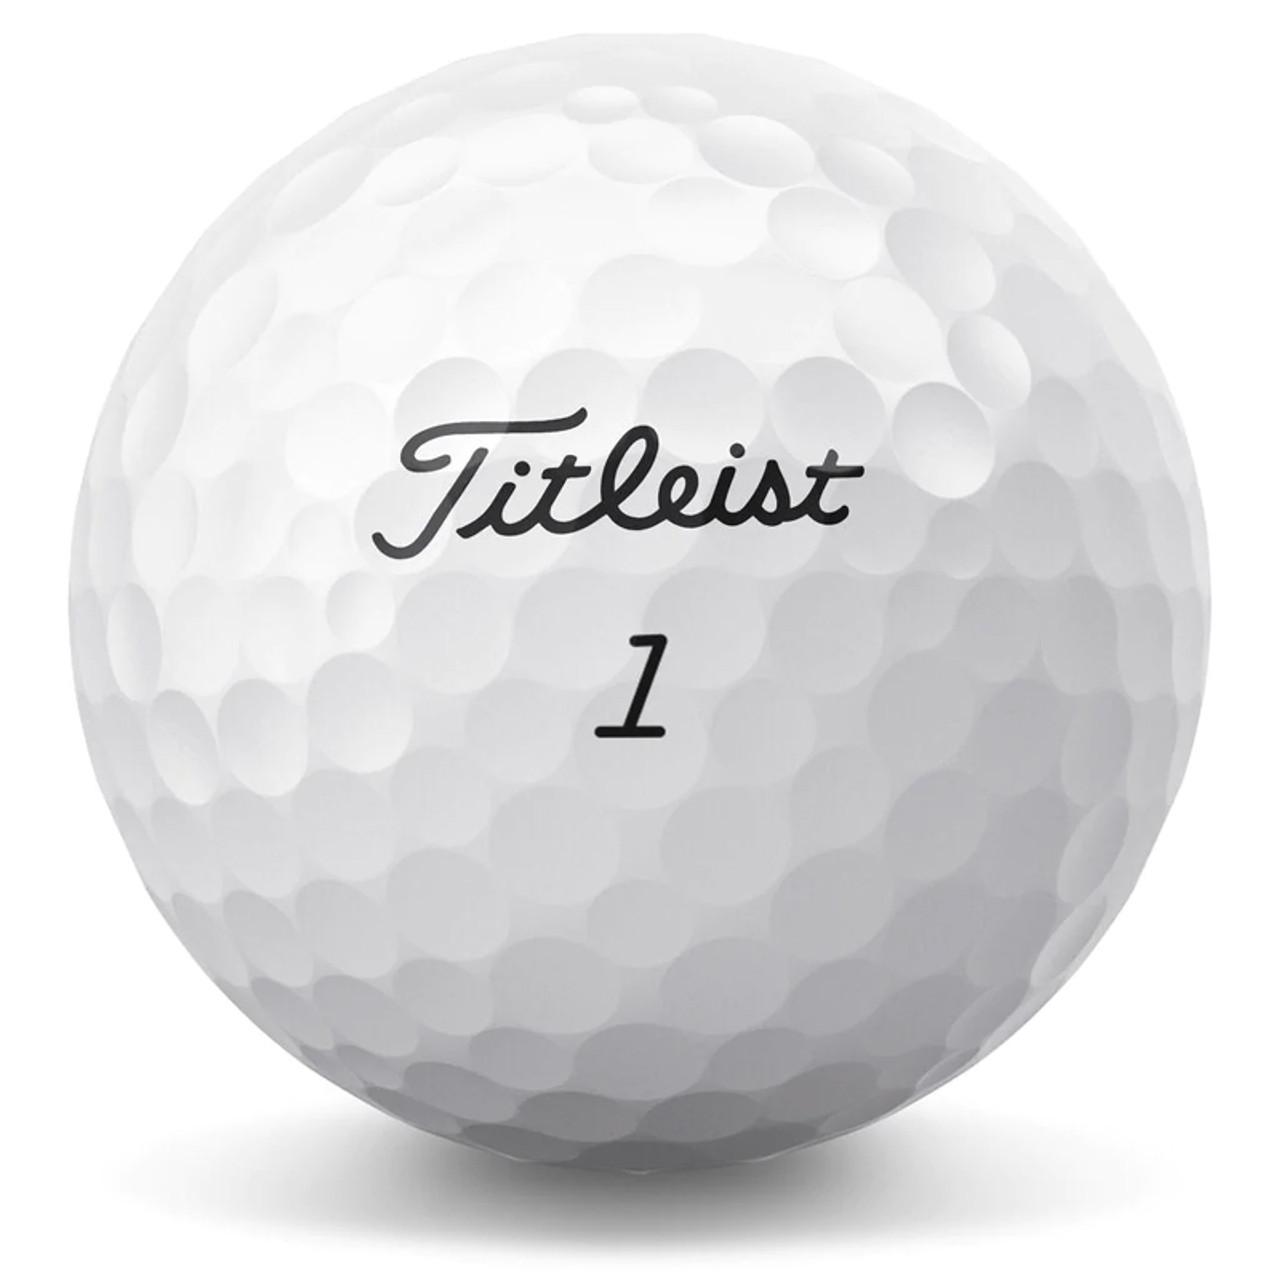 Titleist Tour Soft Personalized Dozen Golf Balls 2020